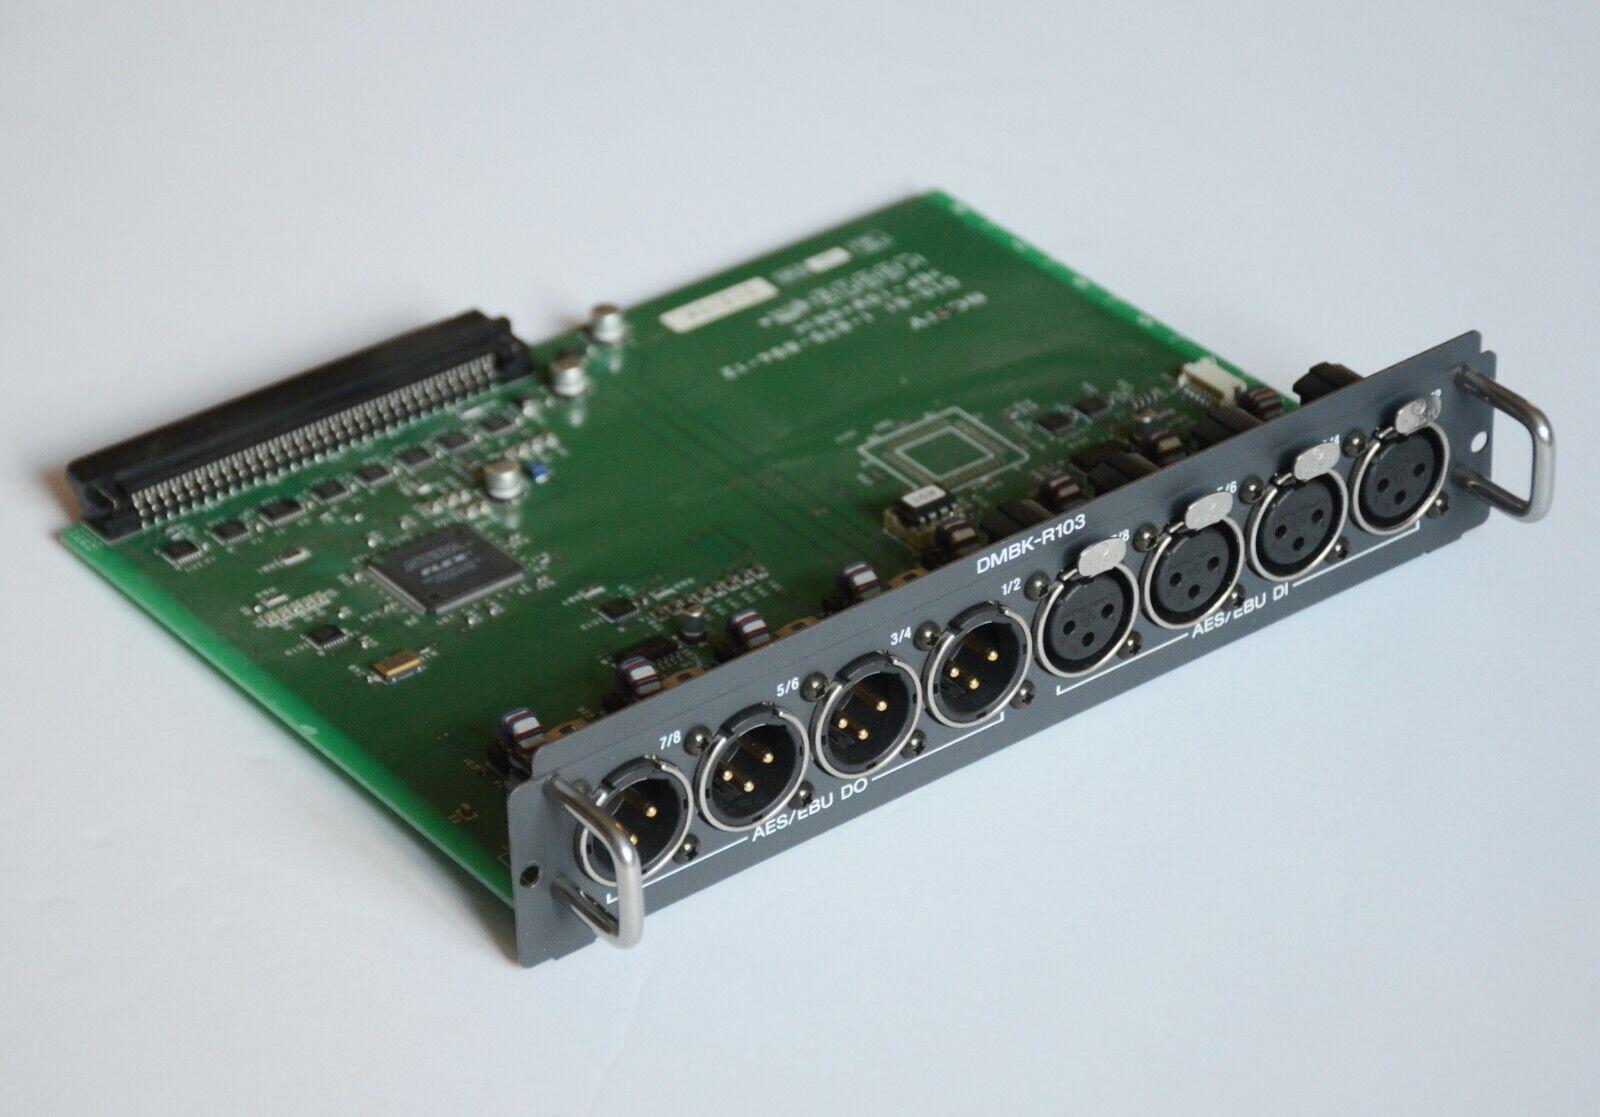 Sony DMBK-R103 AES EBU expansion card